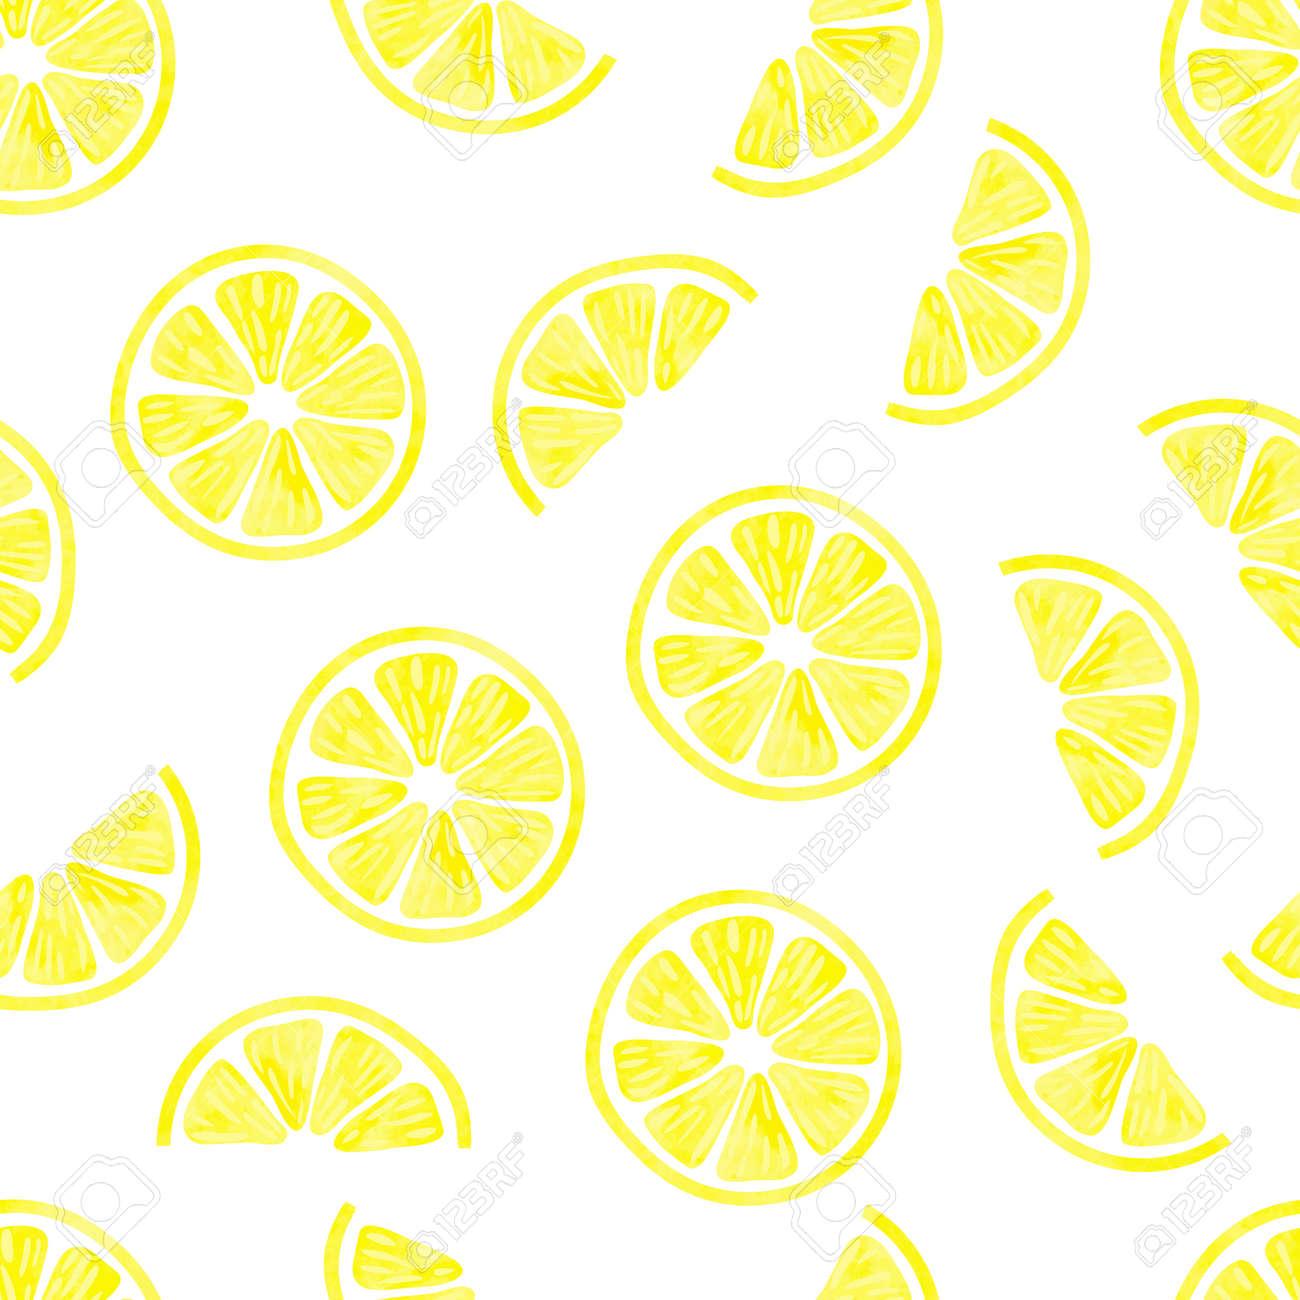 Watercolor Lemon Seamless Pattern Vector Background With Lemon